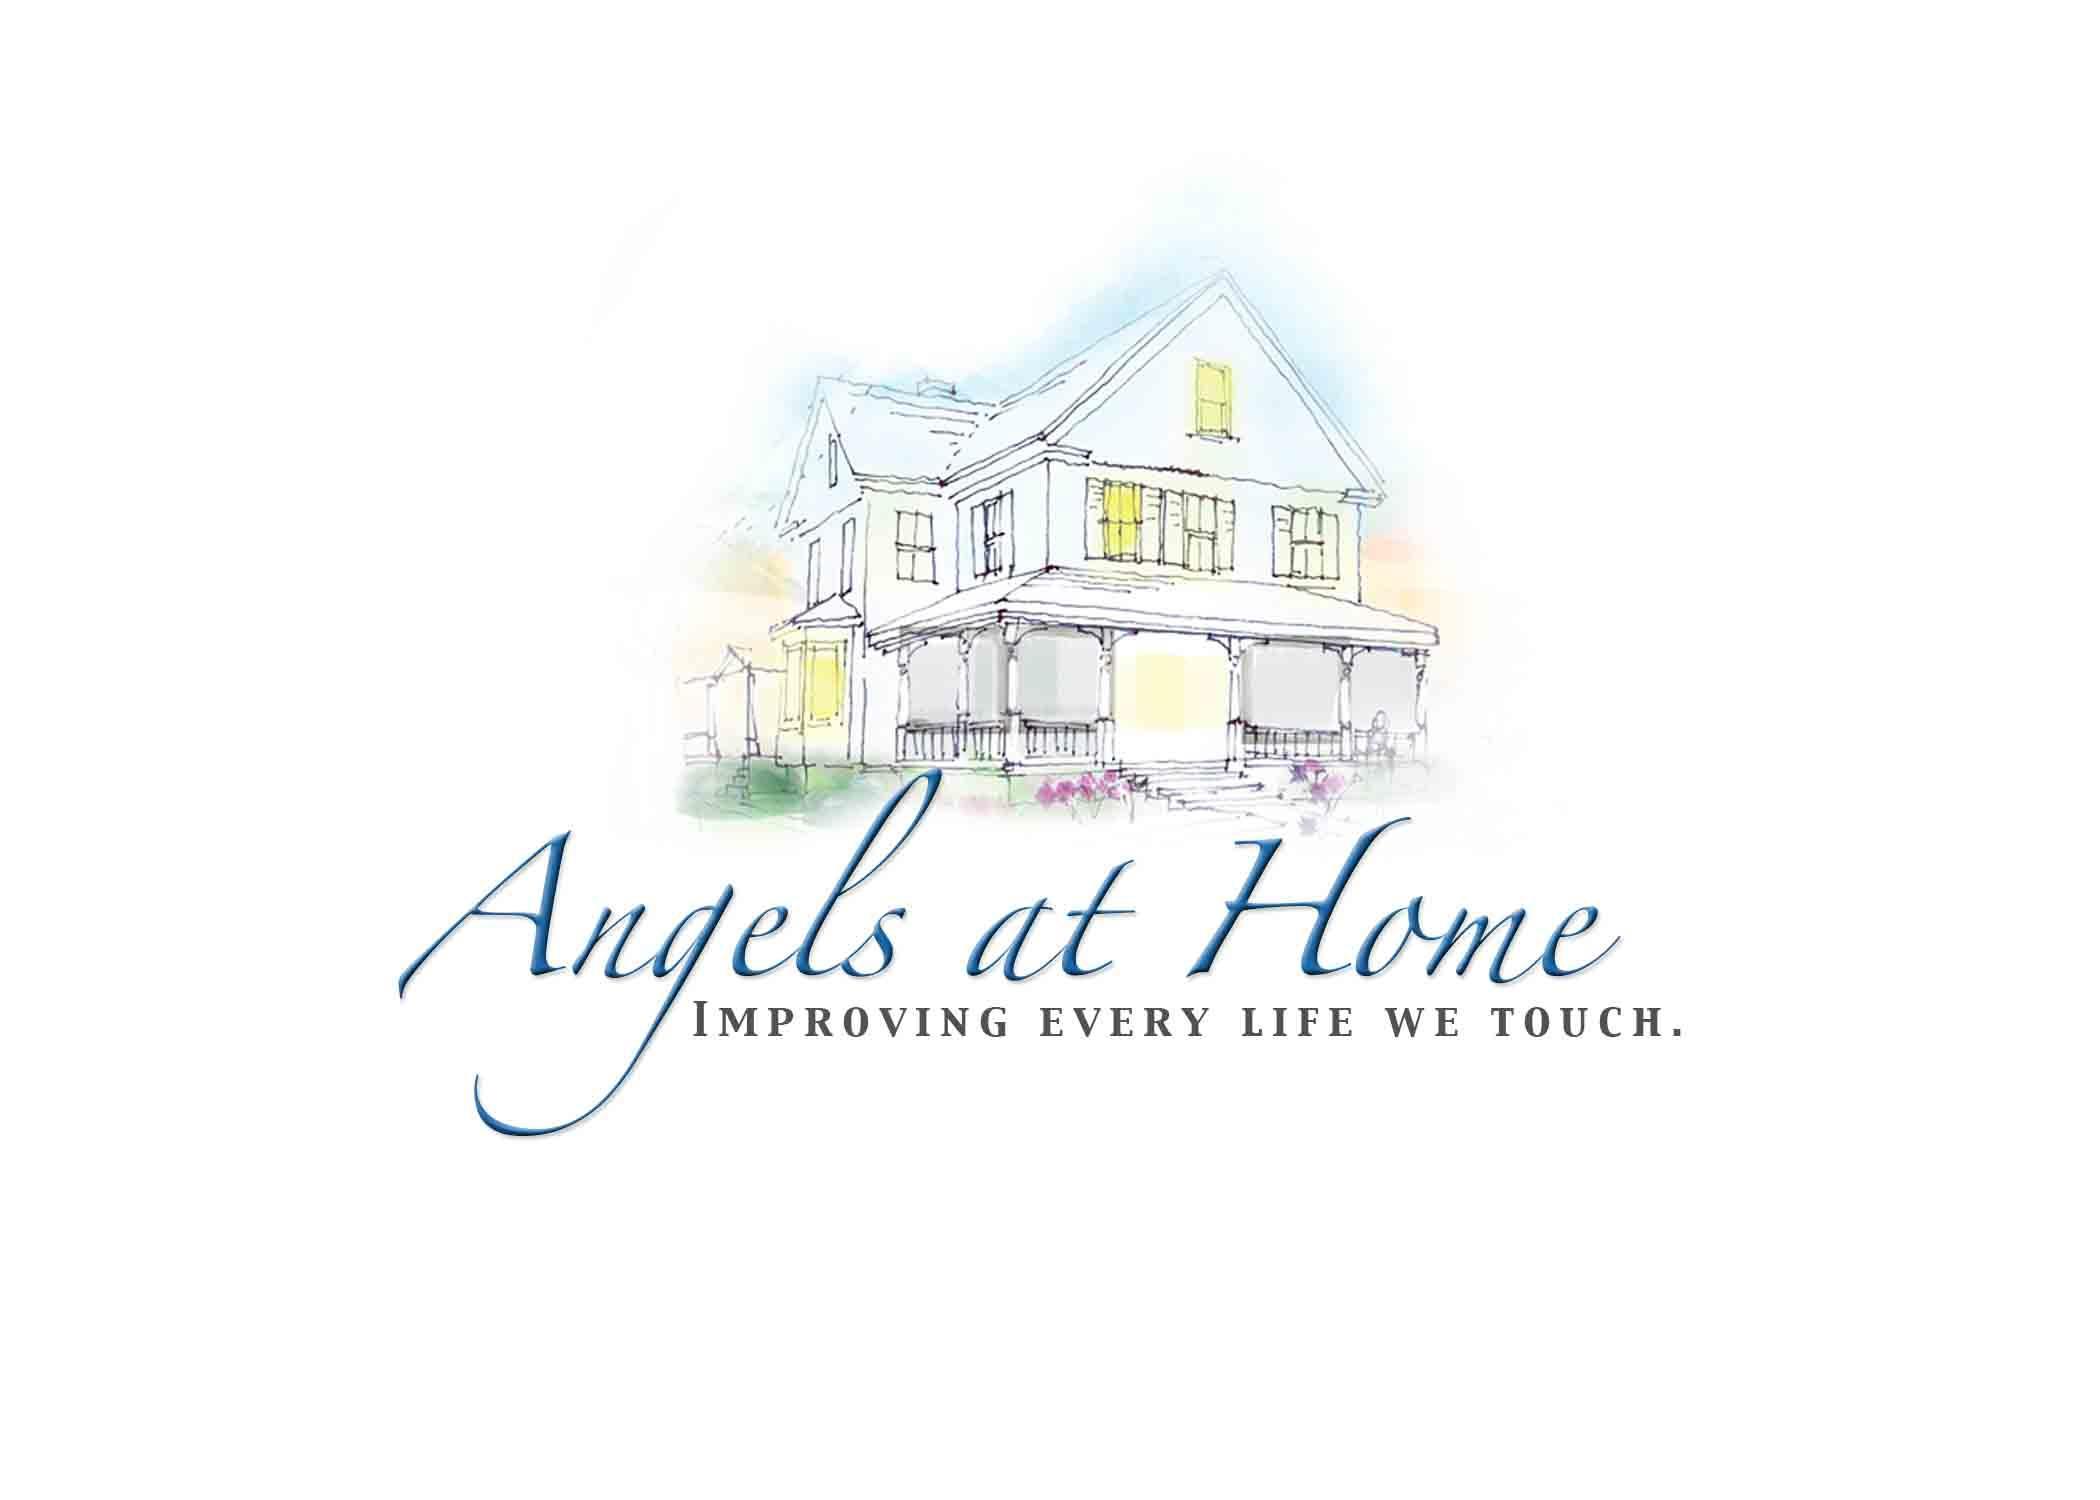 Angels At Home Second St Macon GA Home Health Service MapQuest - Mapquest macon ga